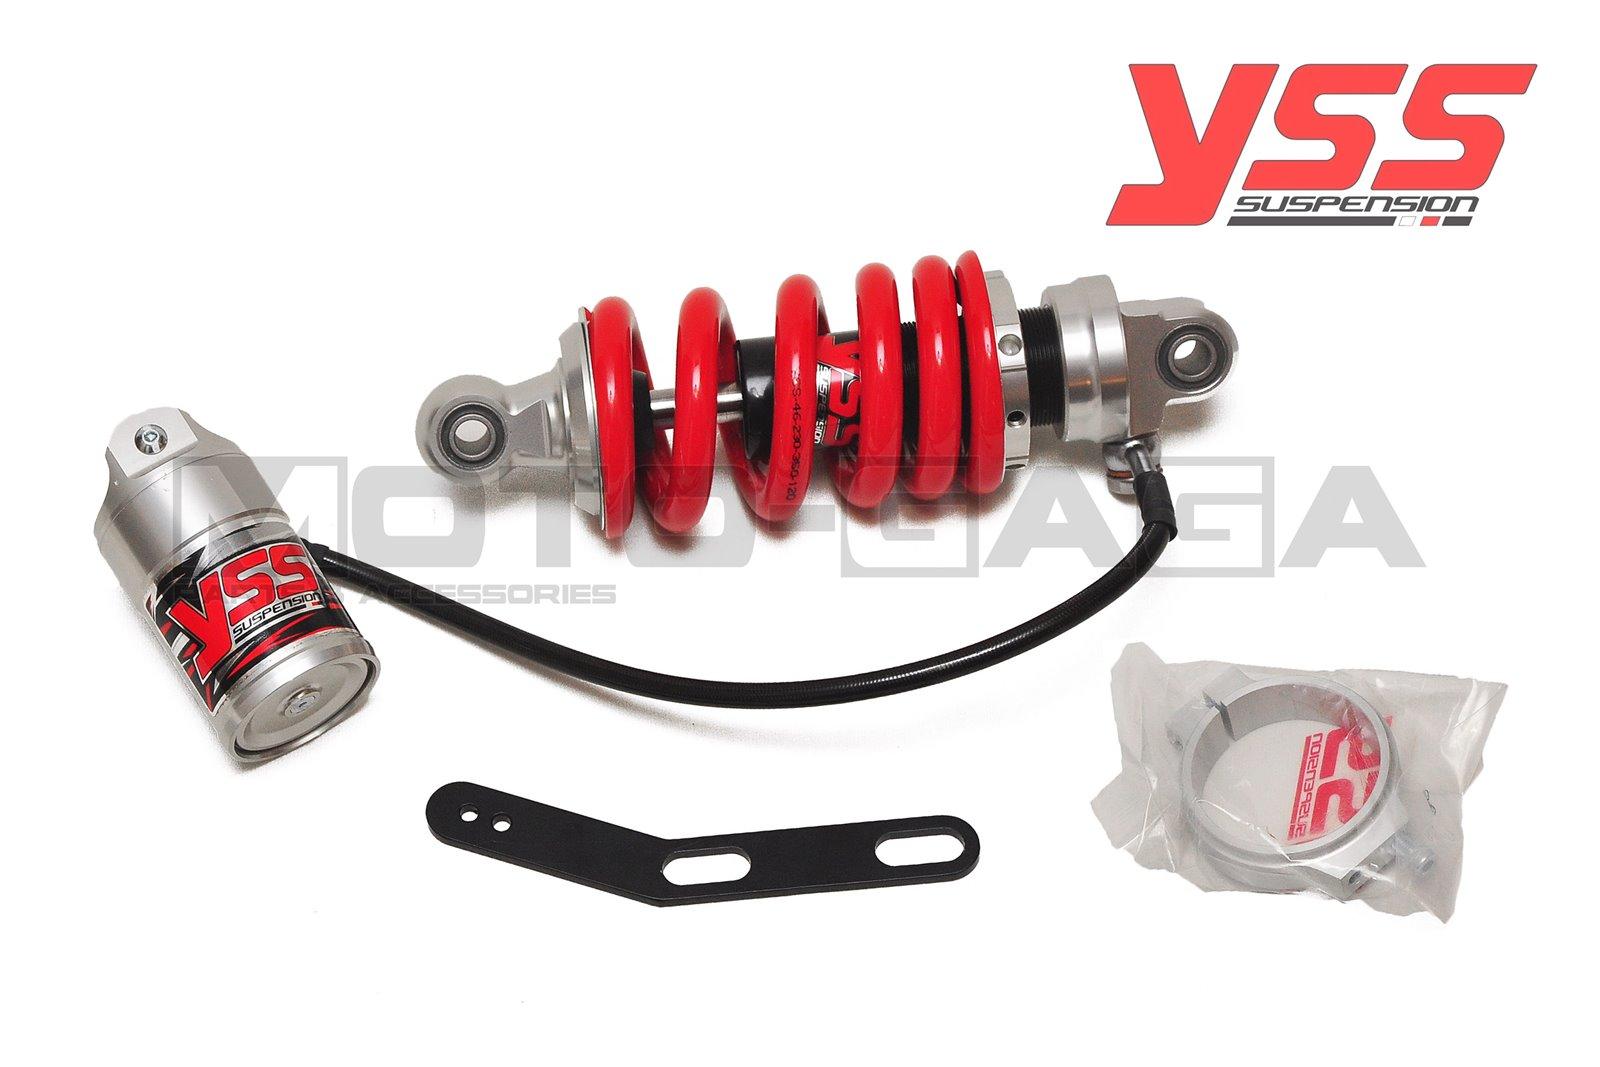 YSS Shock Absorber (MO-270mm) - Yamaha Fz150i Vixion